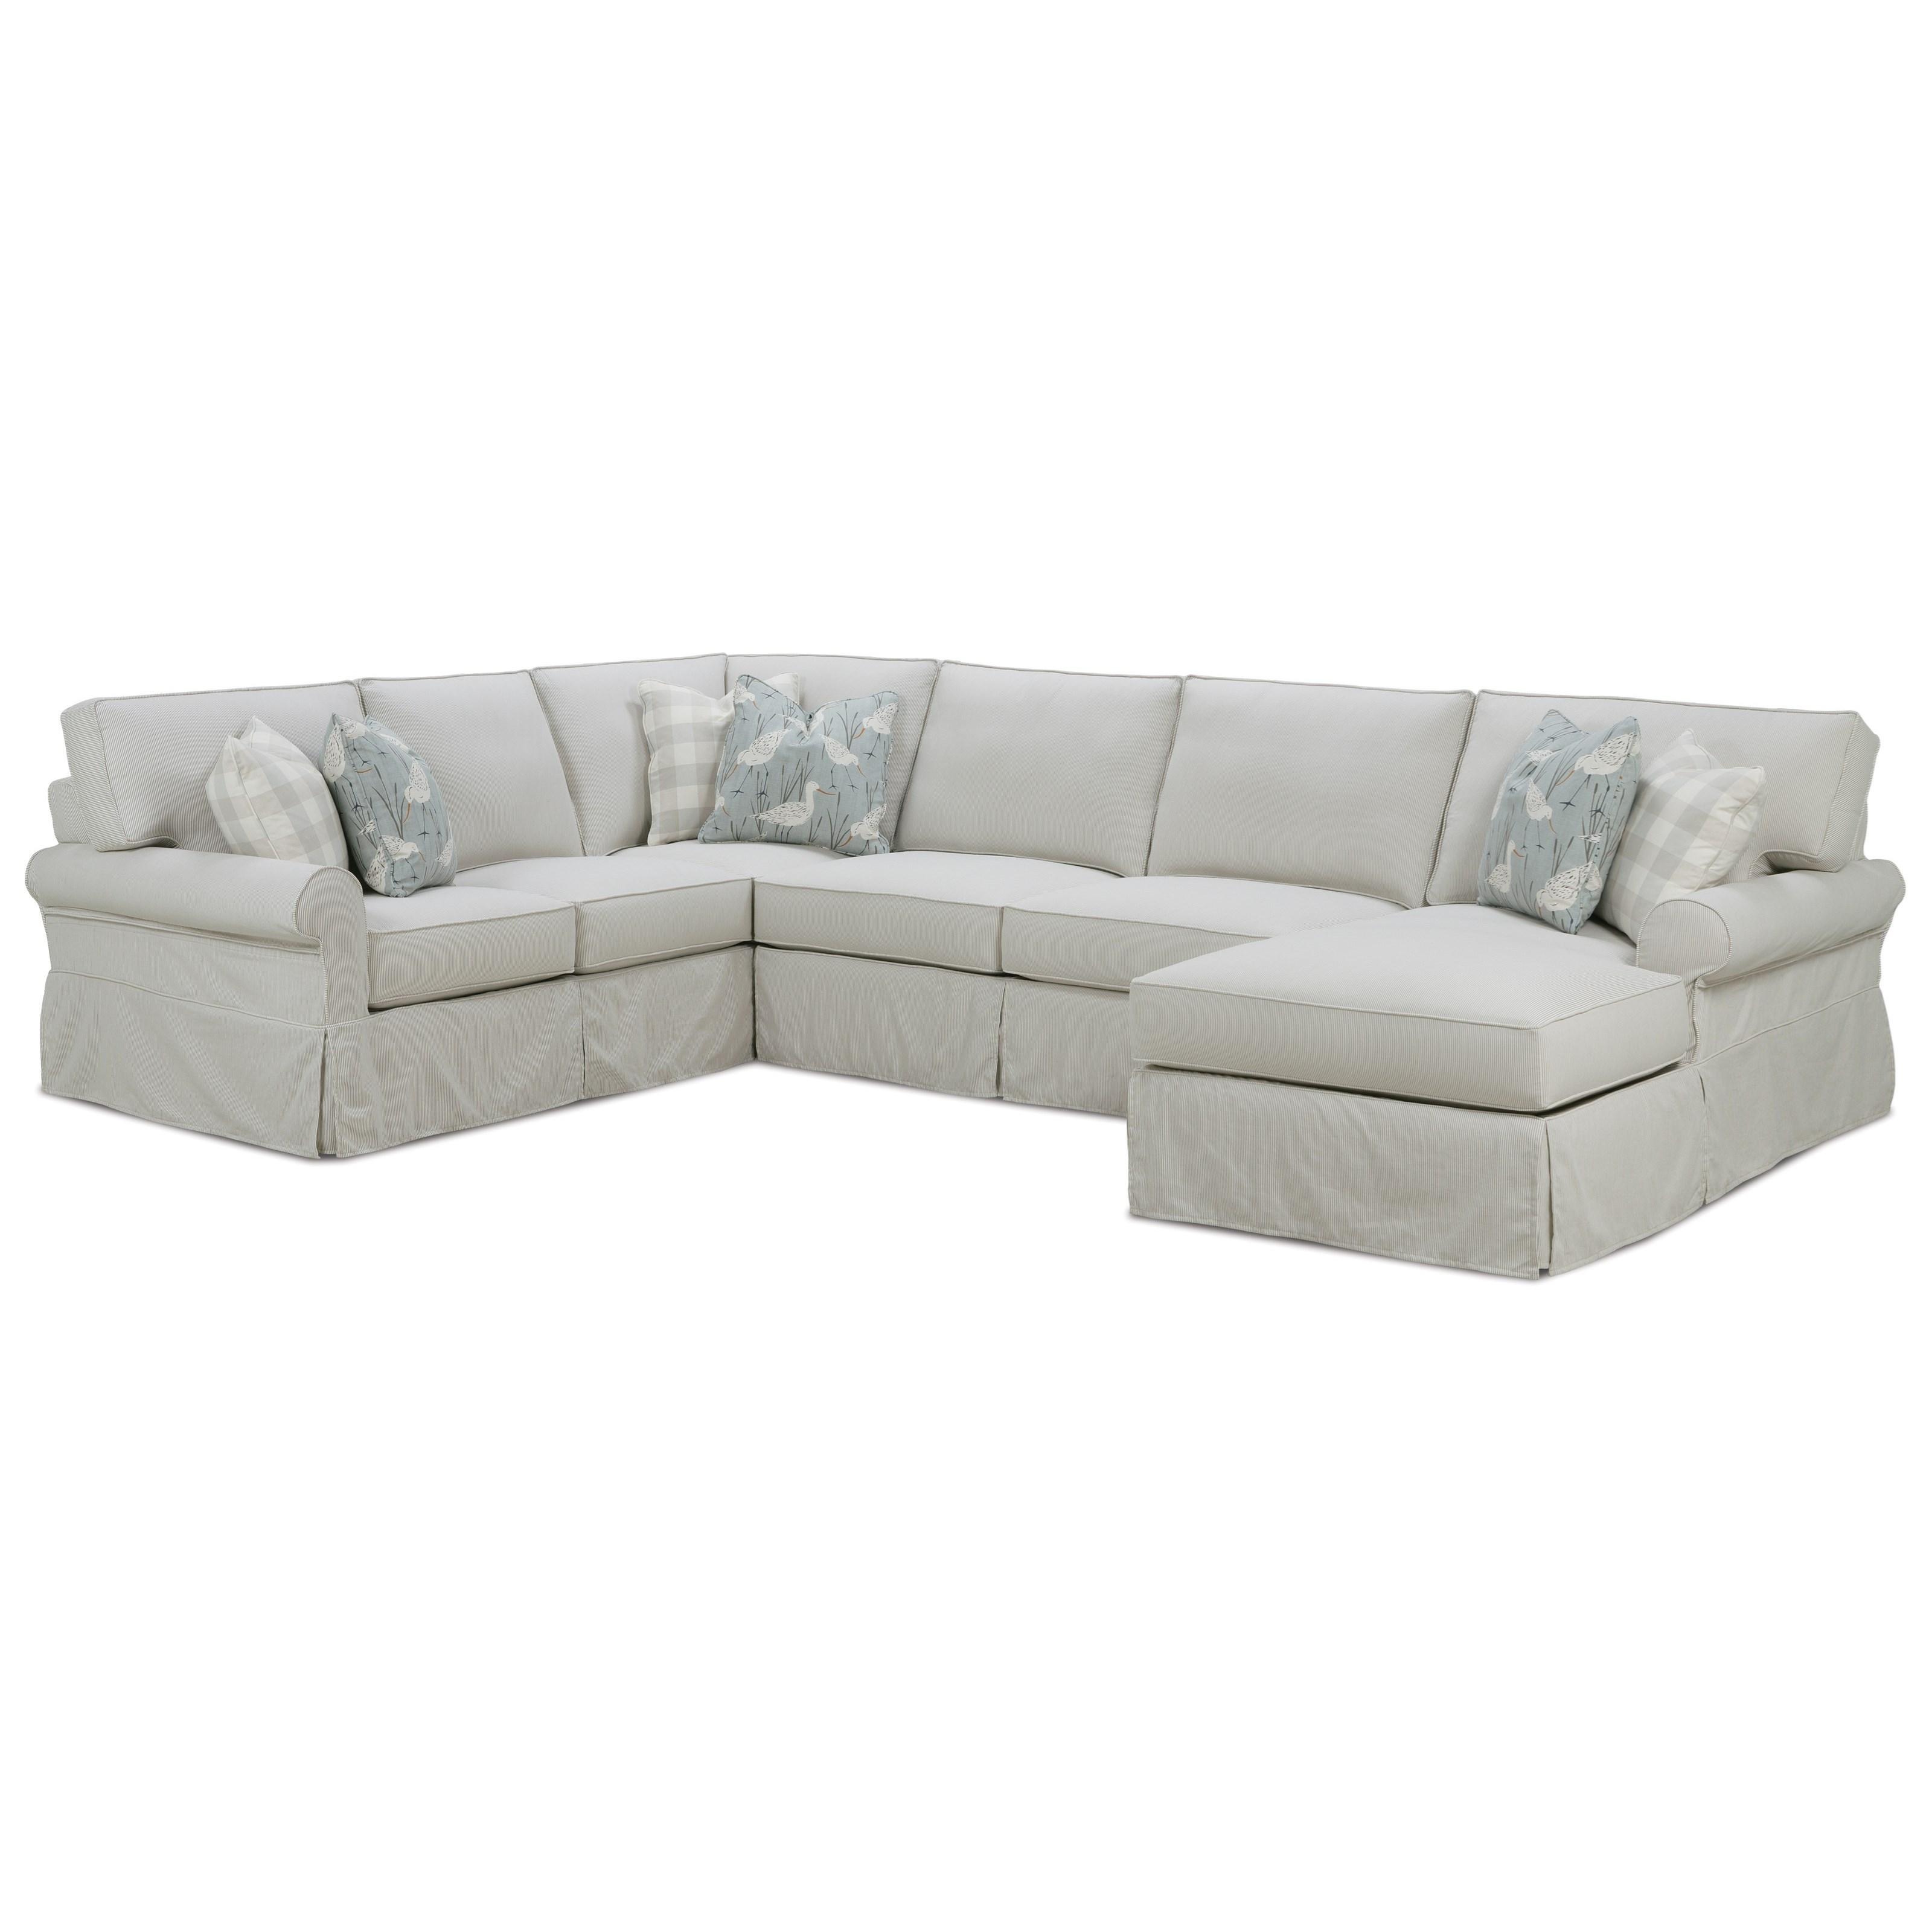 rowe slipcover sofa cheap sofas houston easton casual sectional with sprintz